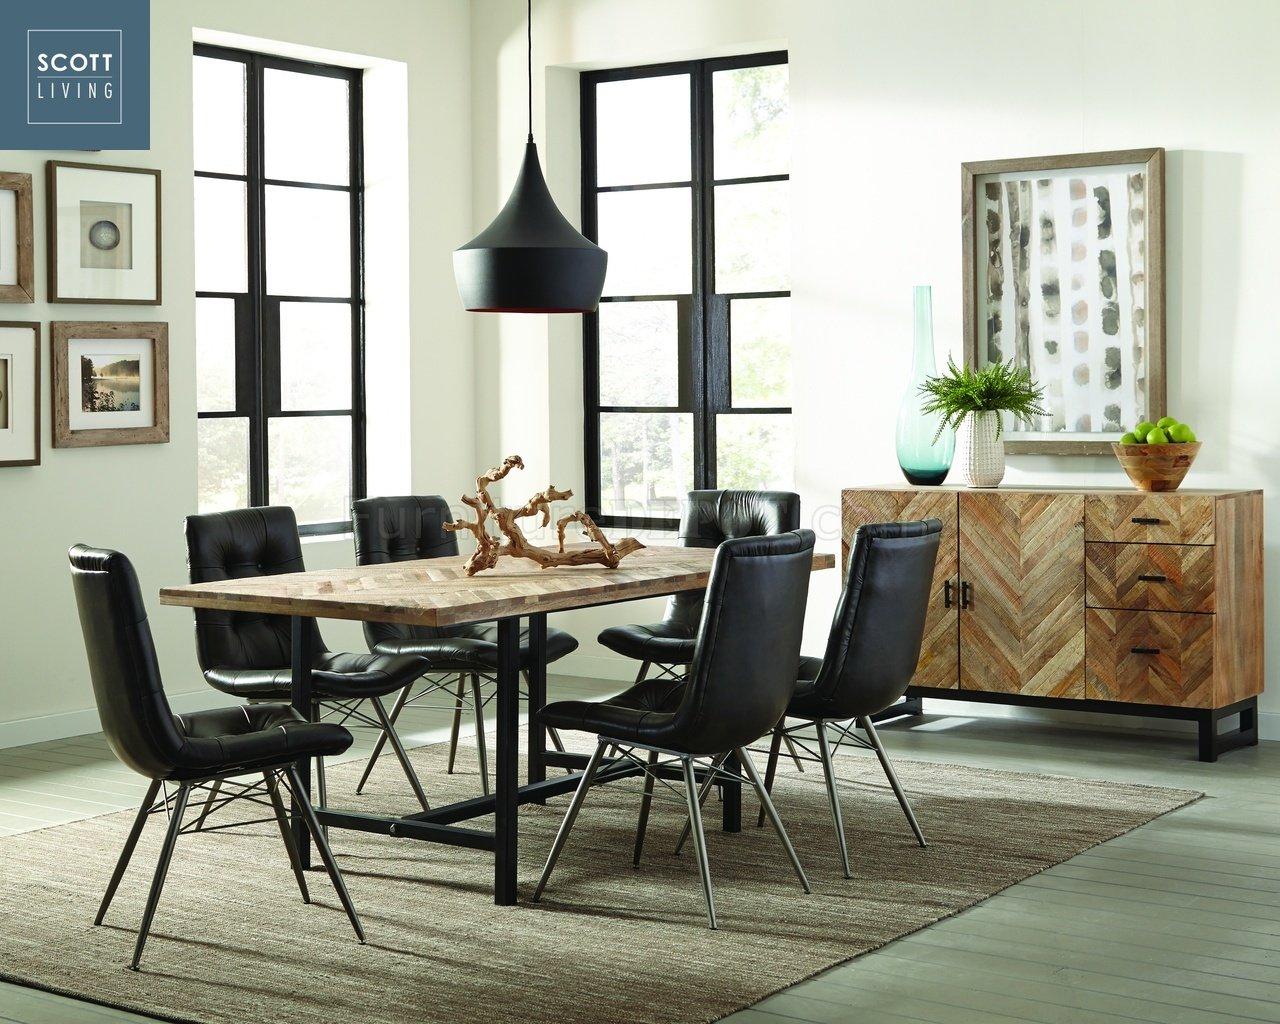 modern leather living room sets decor dark wood floor thompson 107561 - scott coaster natural mango